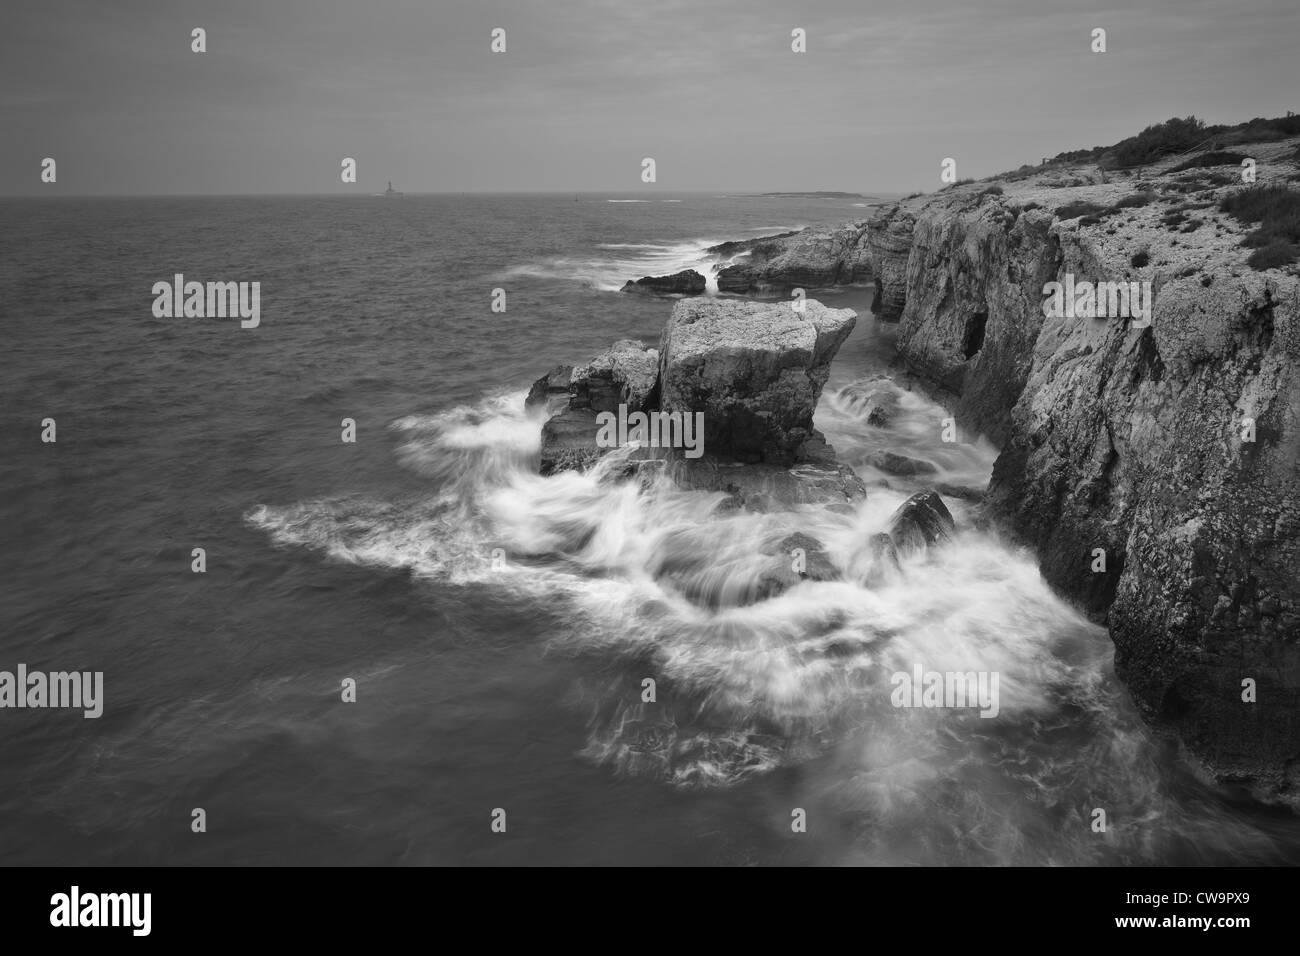 Waves breaking on a solid rock, Cape Kamenjak, Istria, Croatia - Stock Image